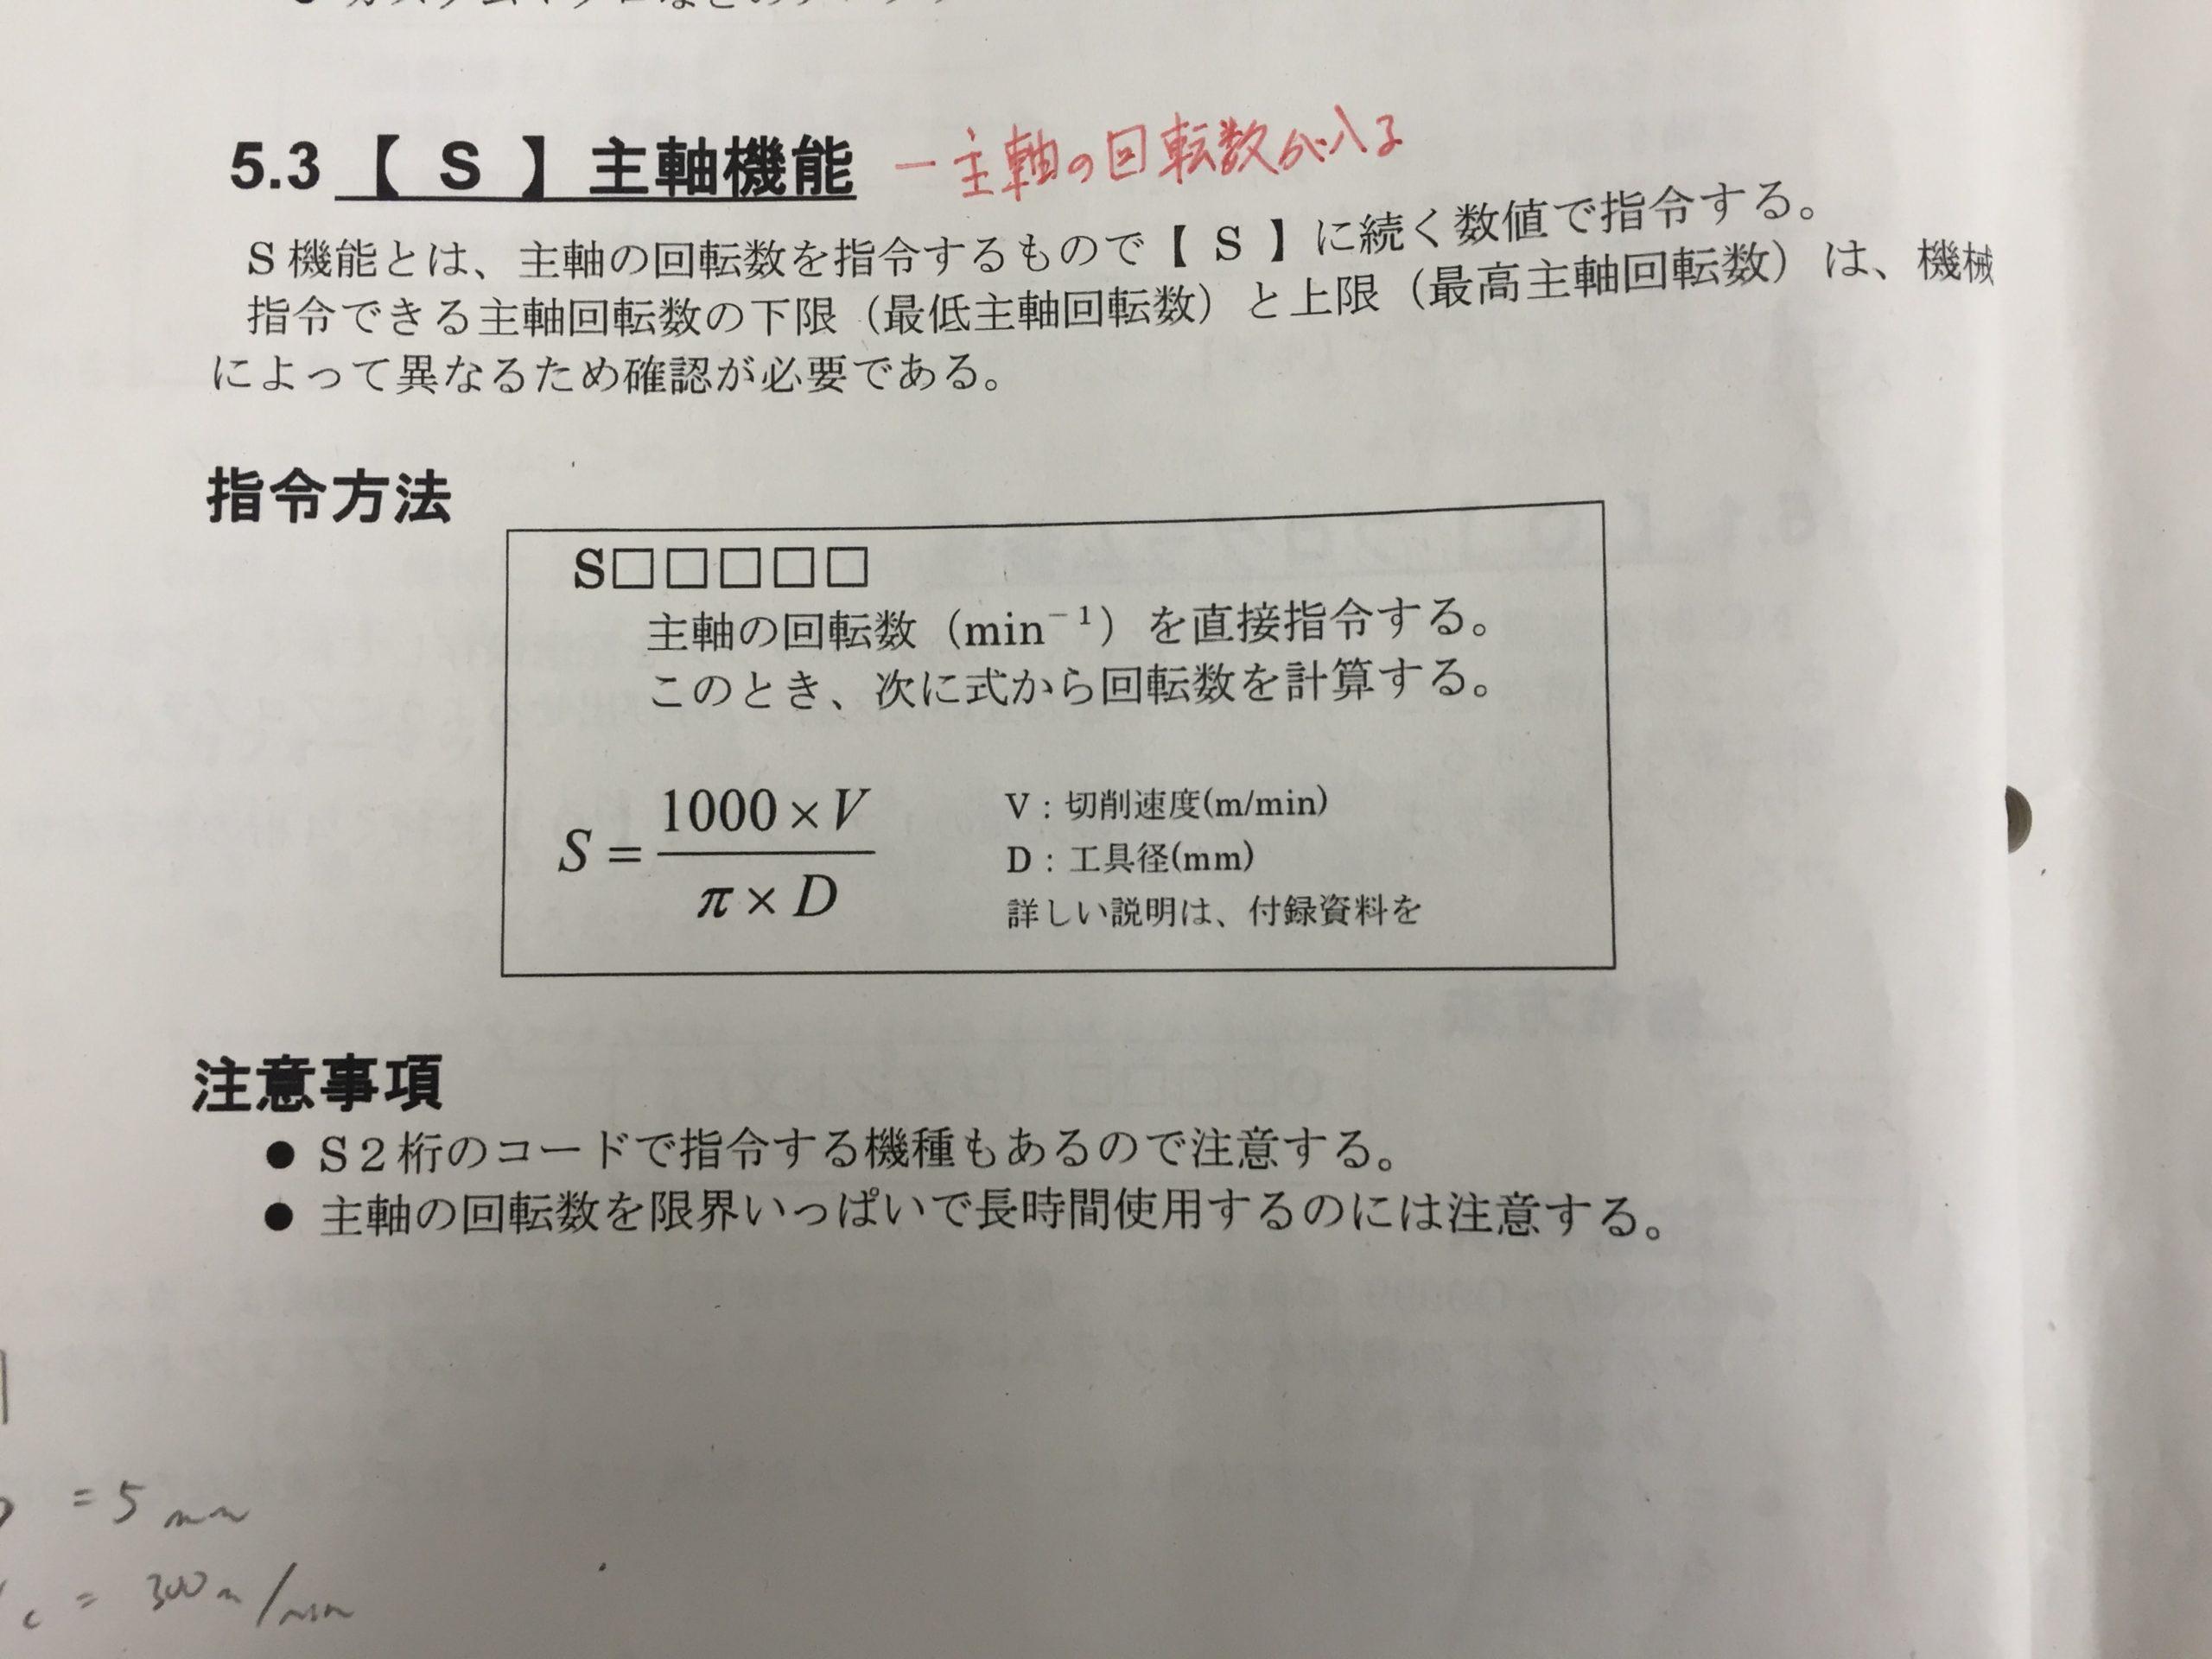 S主軸機能の説明